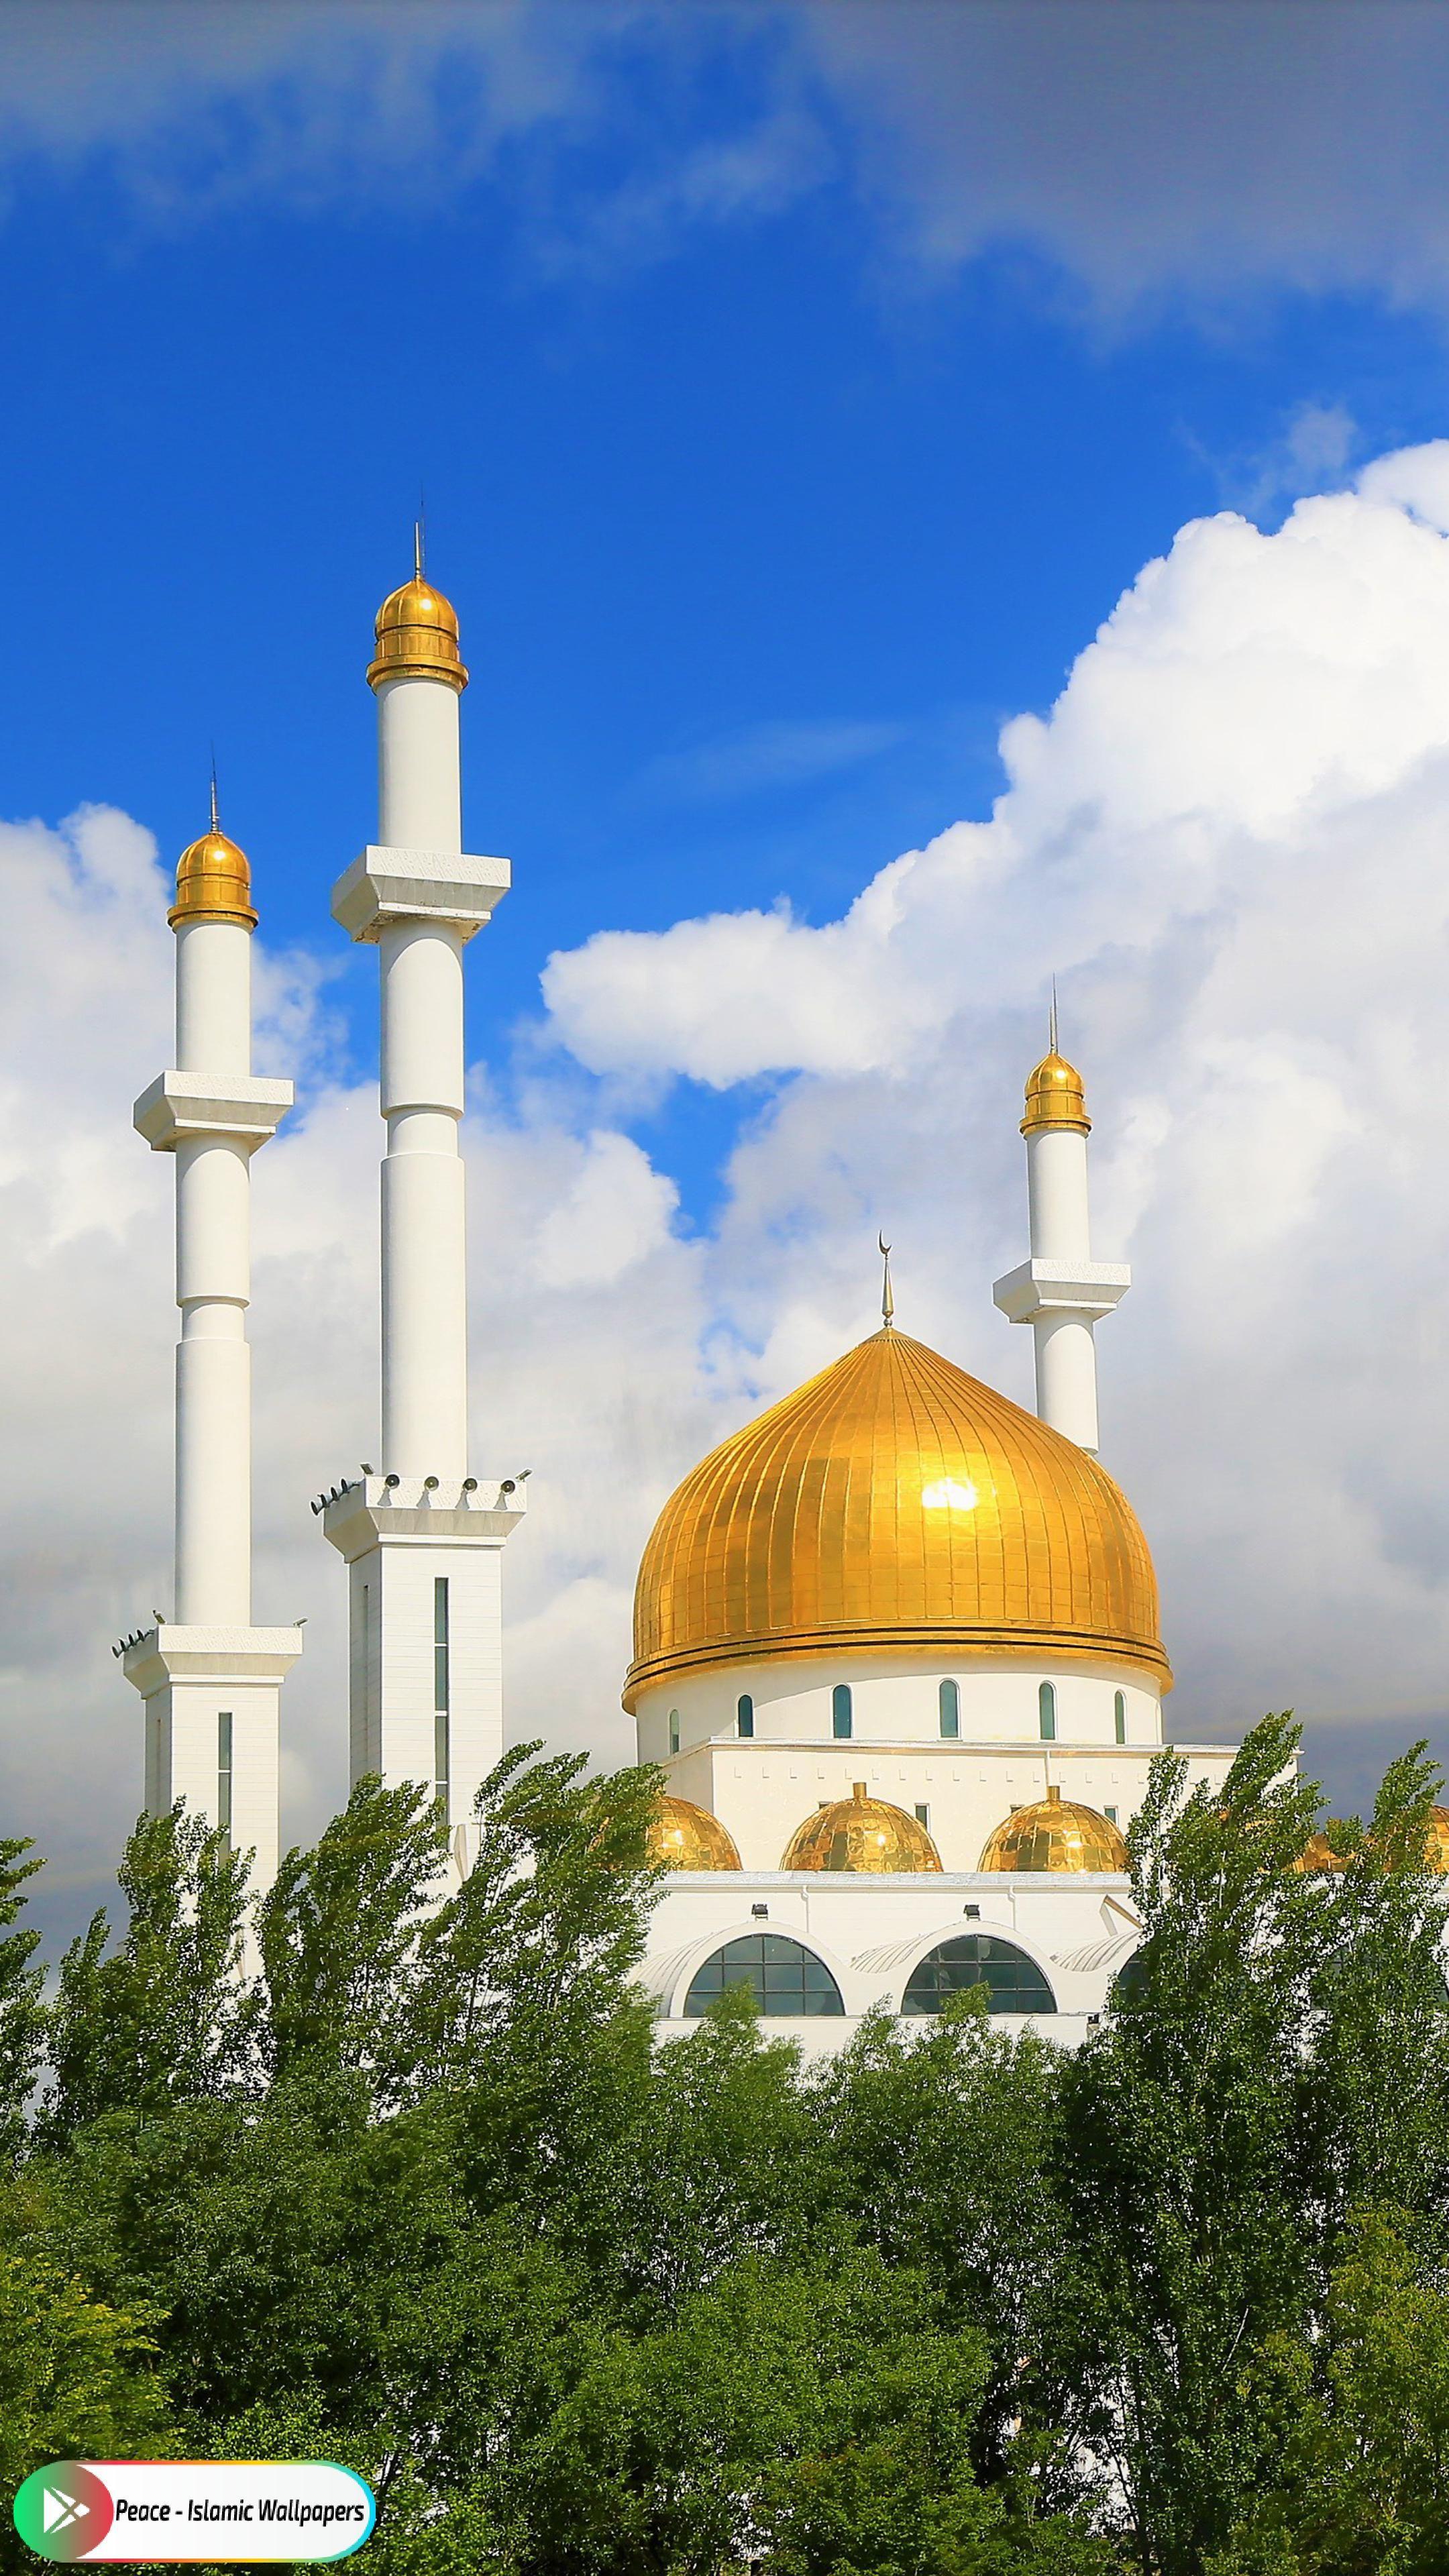 Mosques Islamic Wallpaper Islamic Wallpaper Islamic Wallpaper Hd Wallpaper